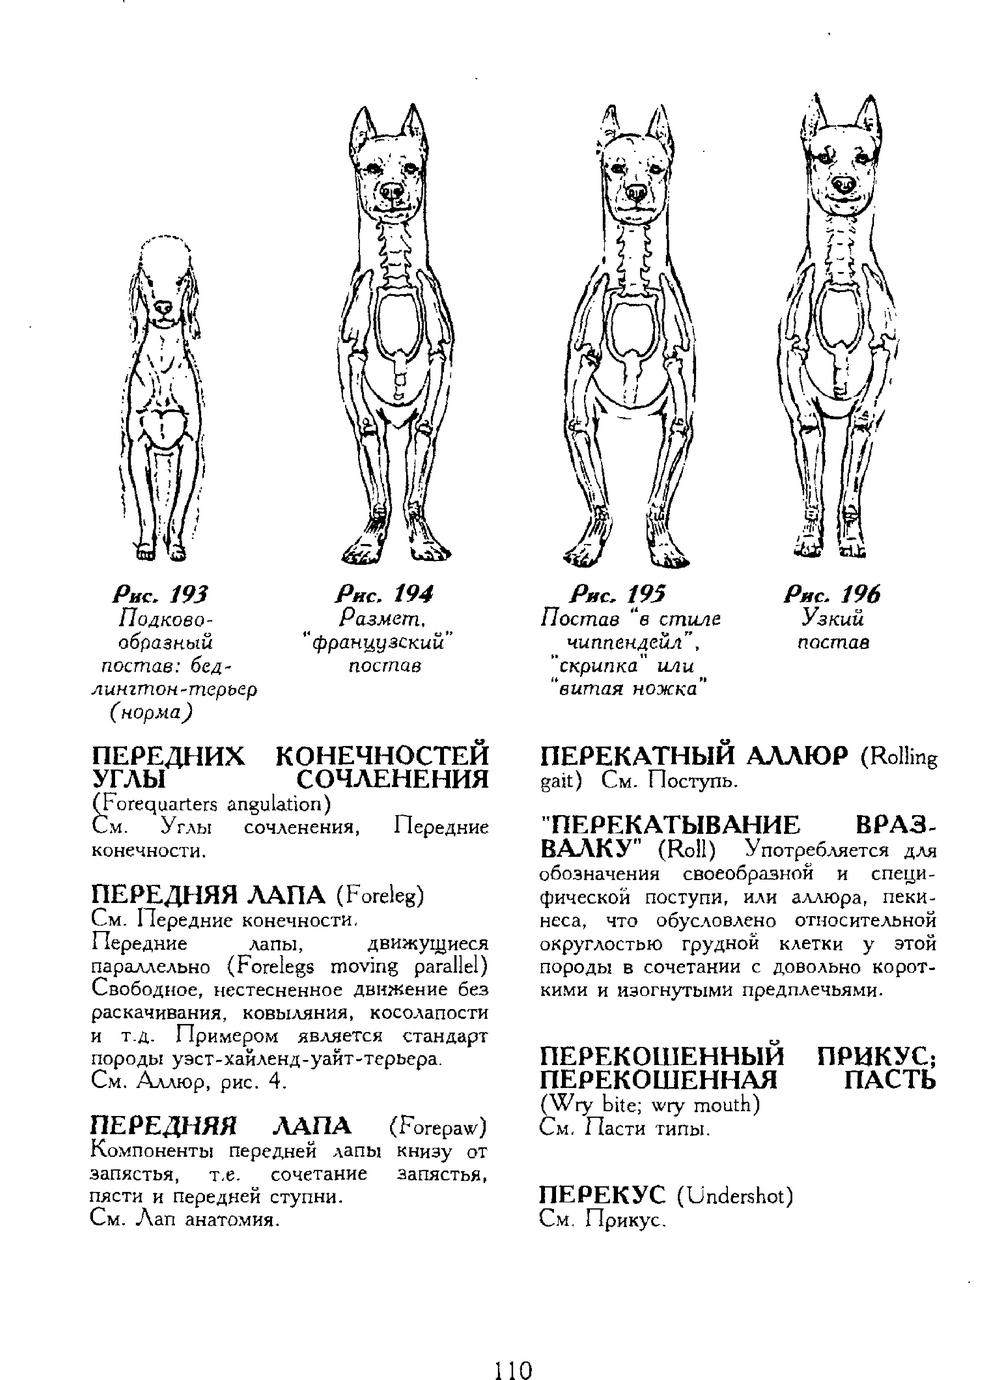 http://i6.imageban.ru/out/2013/11/25/e91138e6397a6a56195aa2028e29517b.jpg